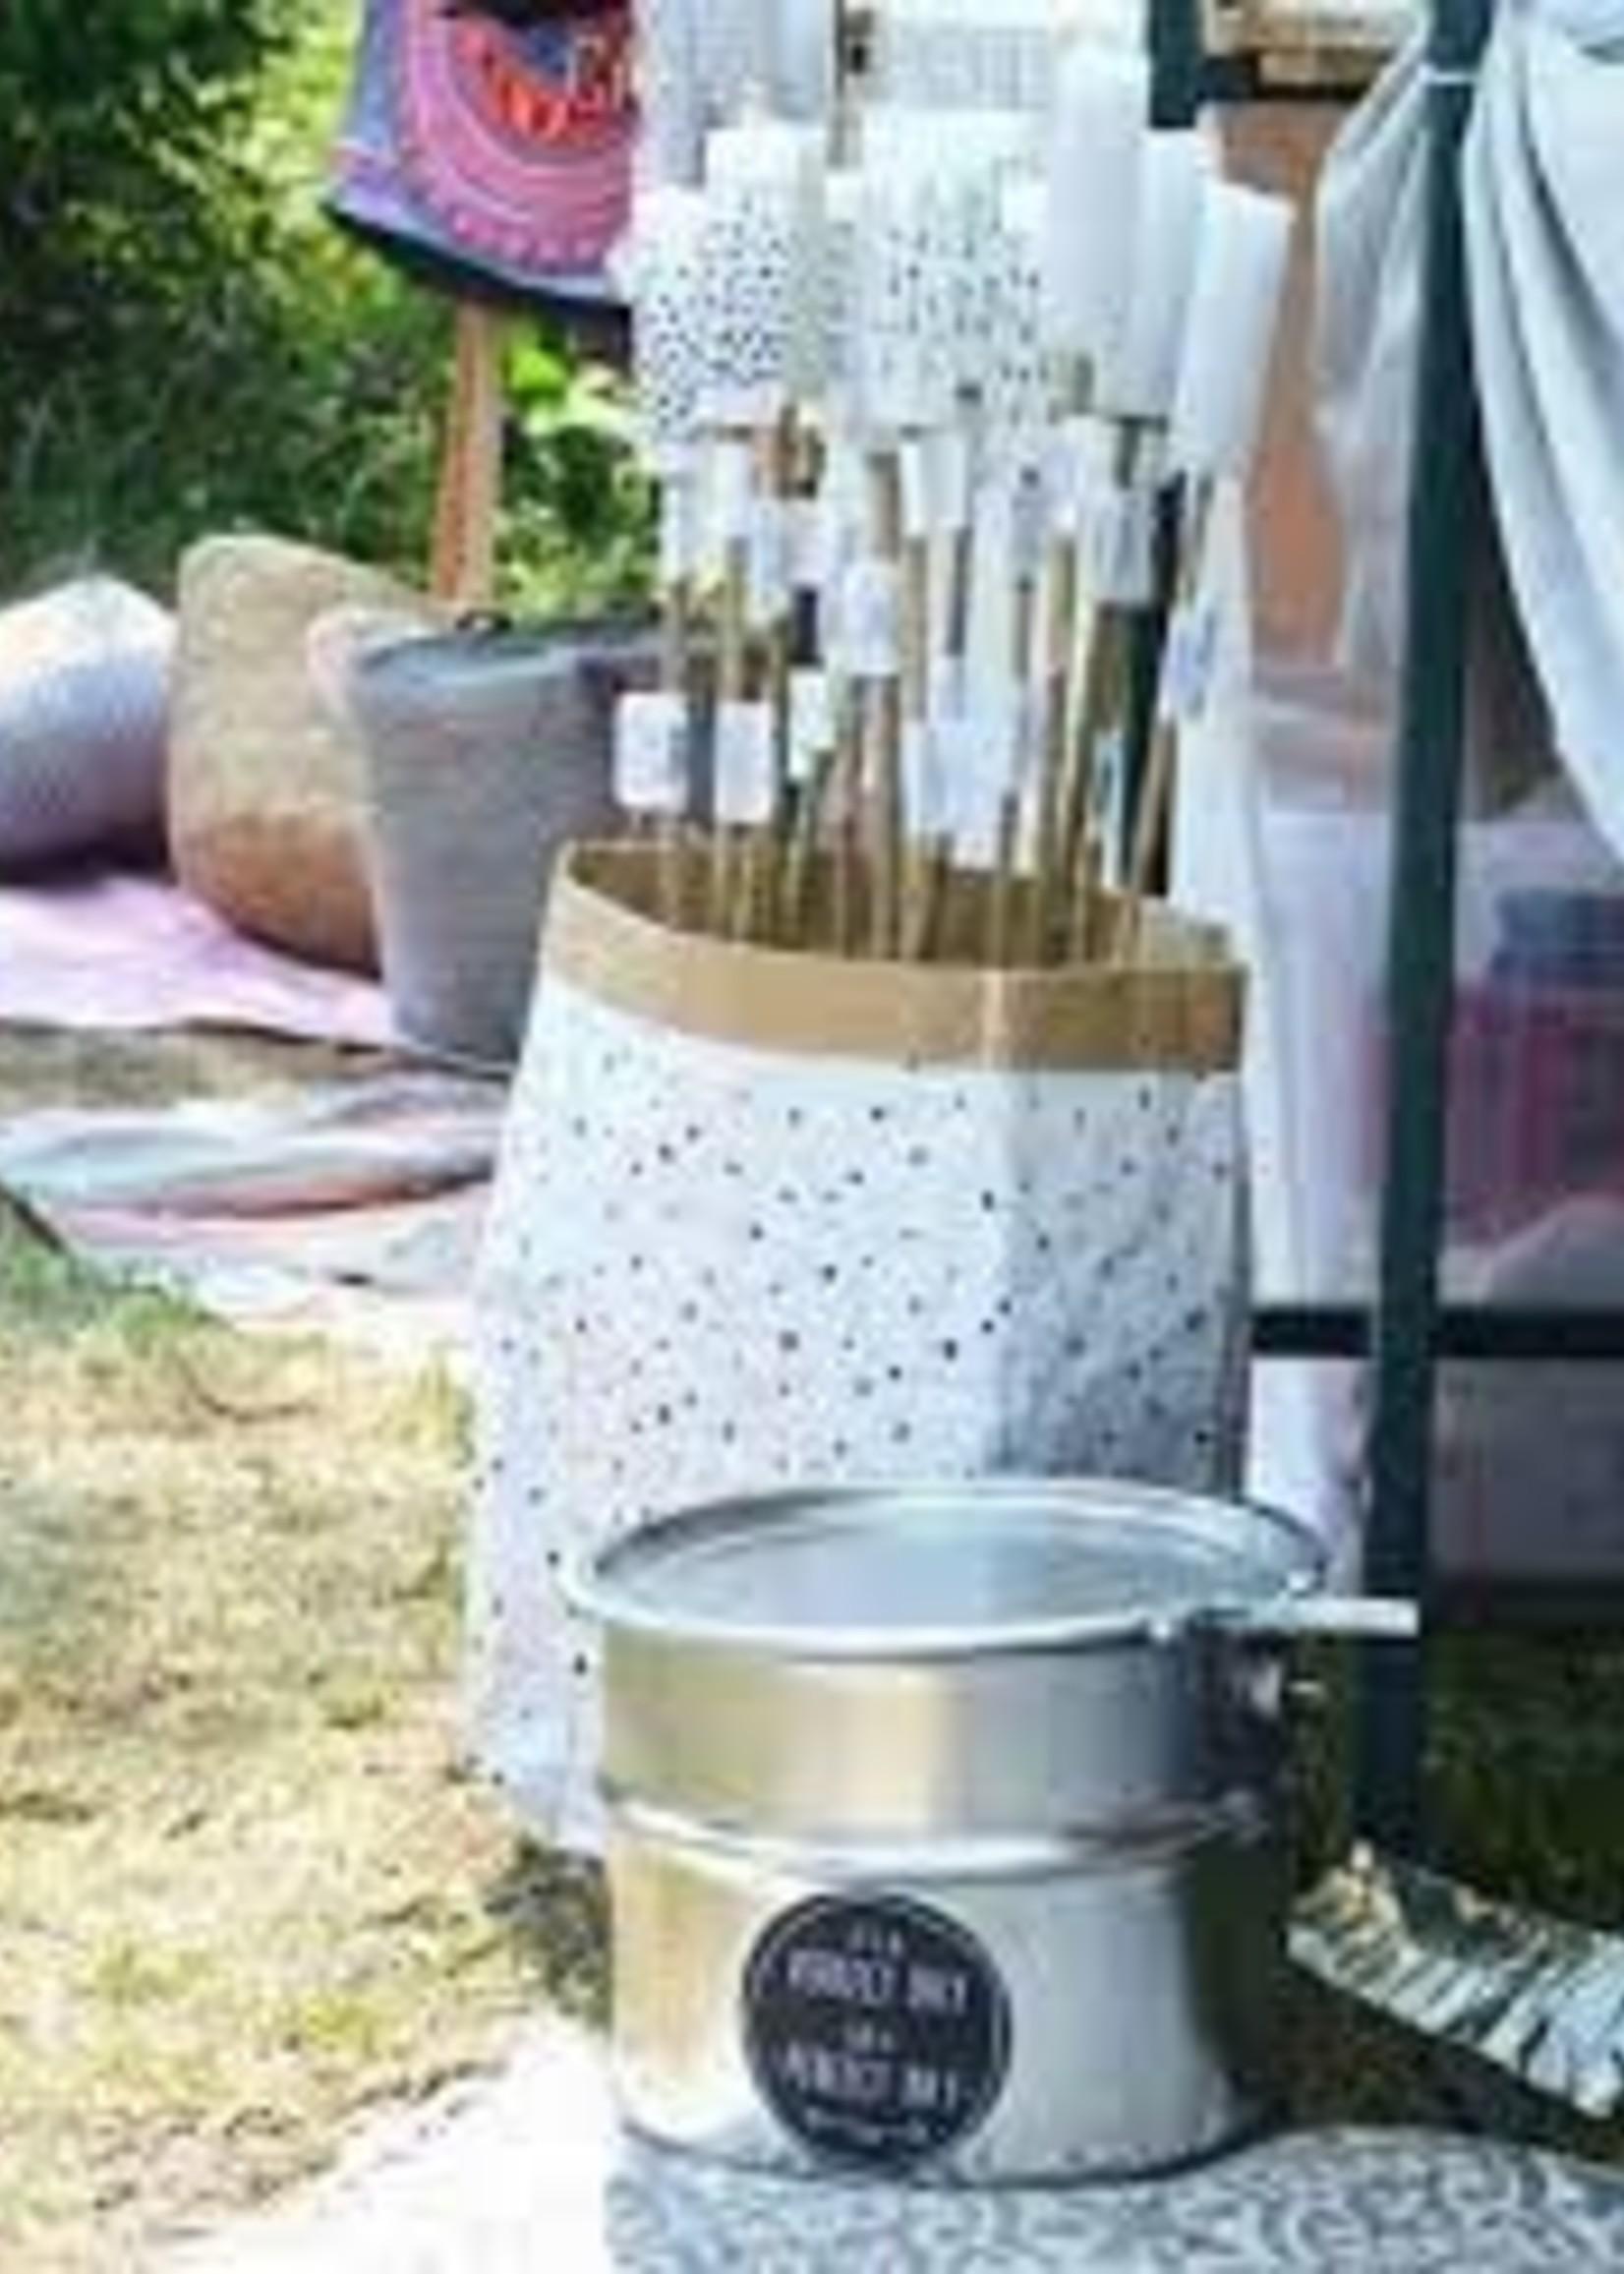 Rustik RRustik- Bamboe Tuin Fakkel 63cm - Koel Grijs kaars -3.8 x12cm - Eco Friendly